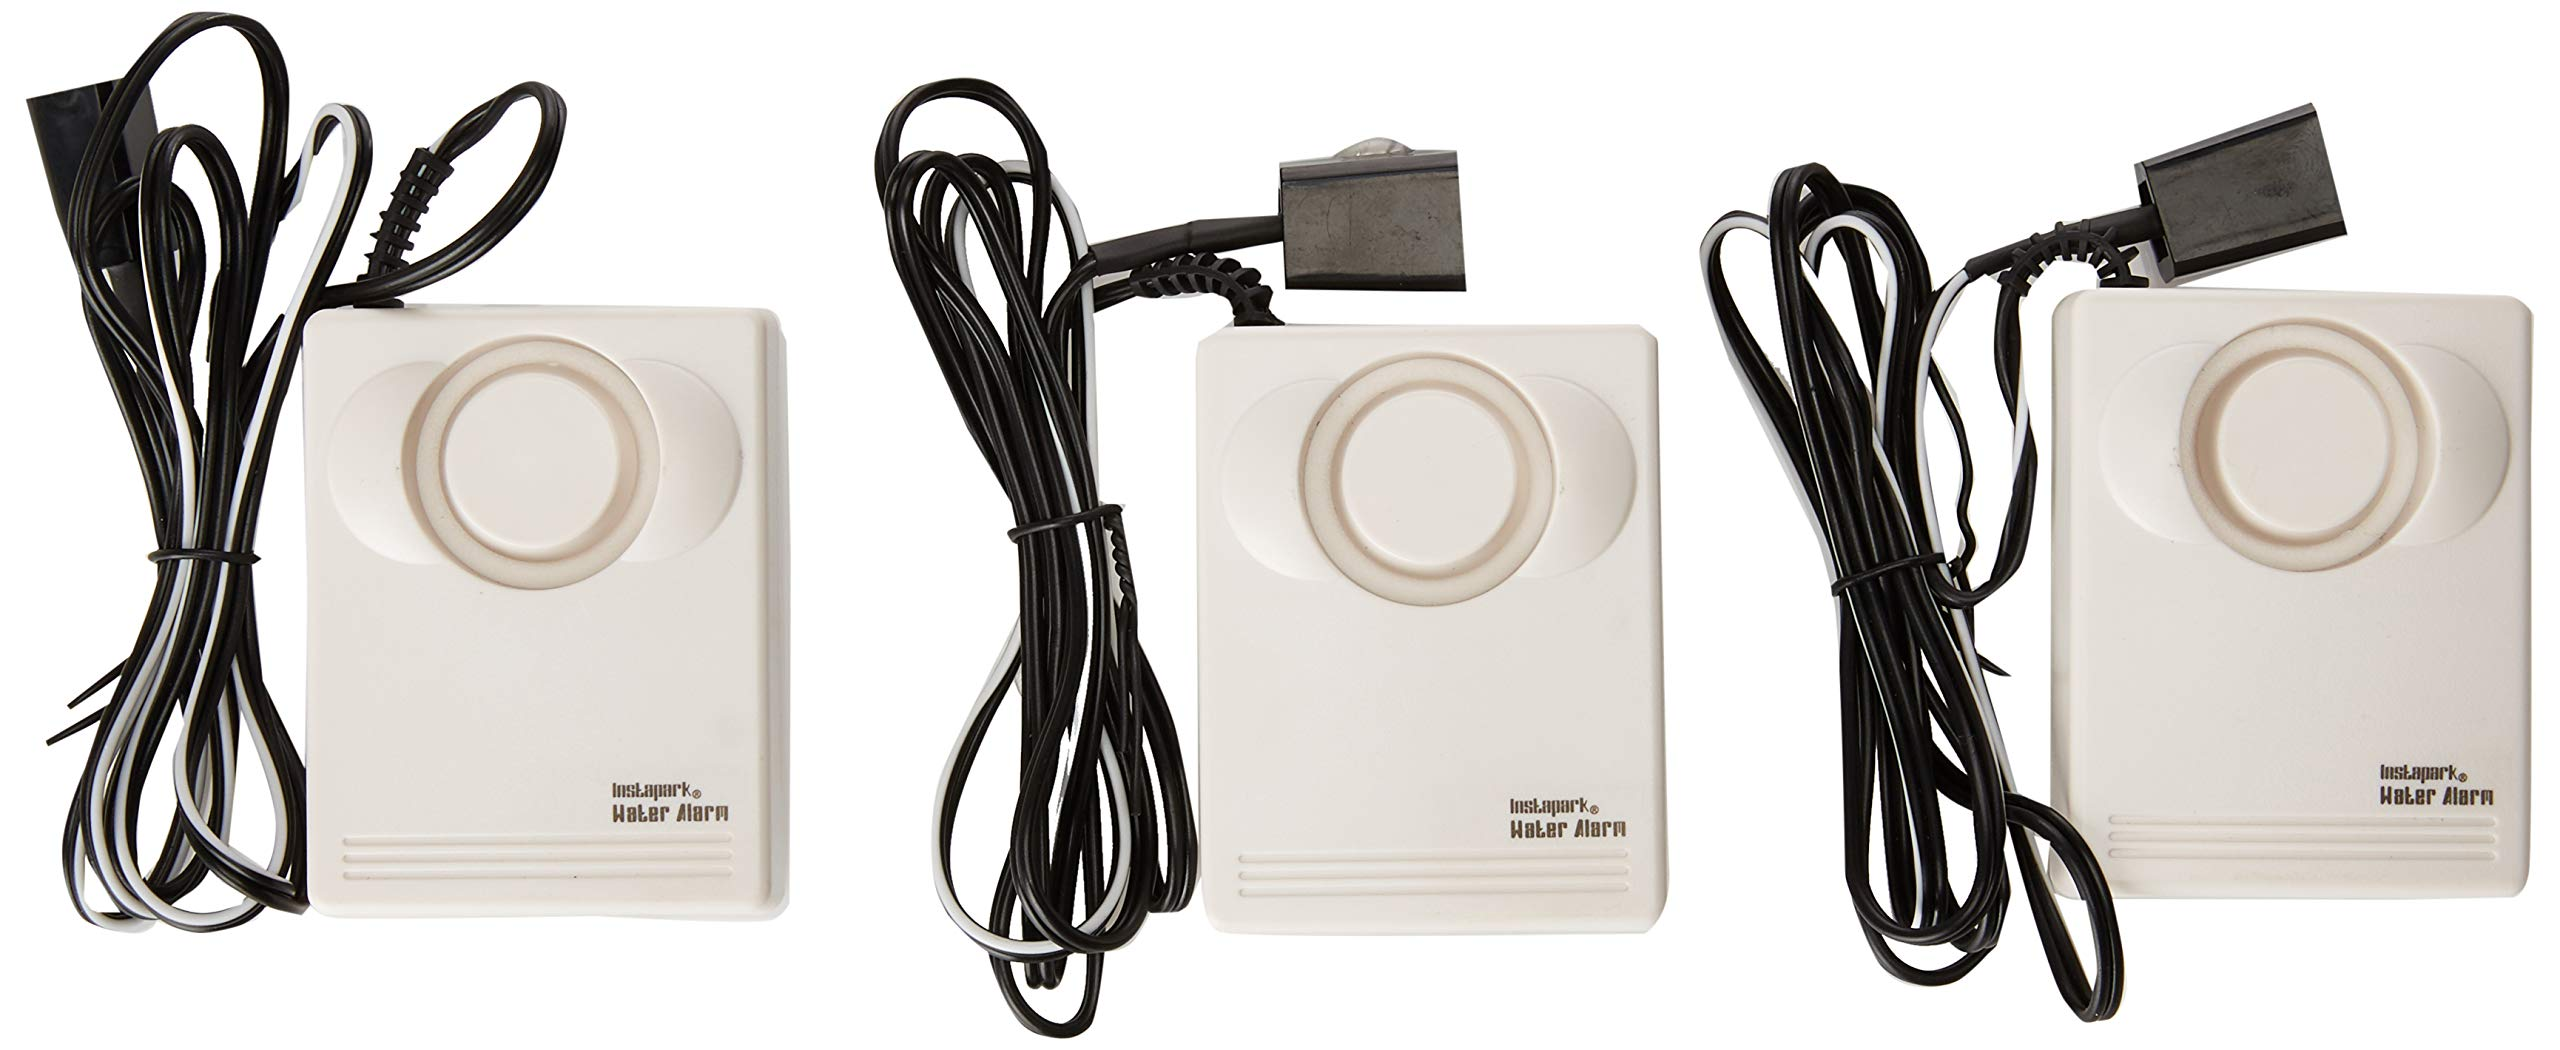 Instapark Water Leakage Detection Alarm and Sensor, Low Battery Alert by Instapark